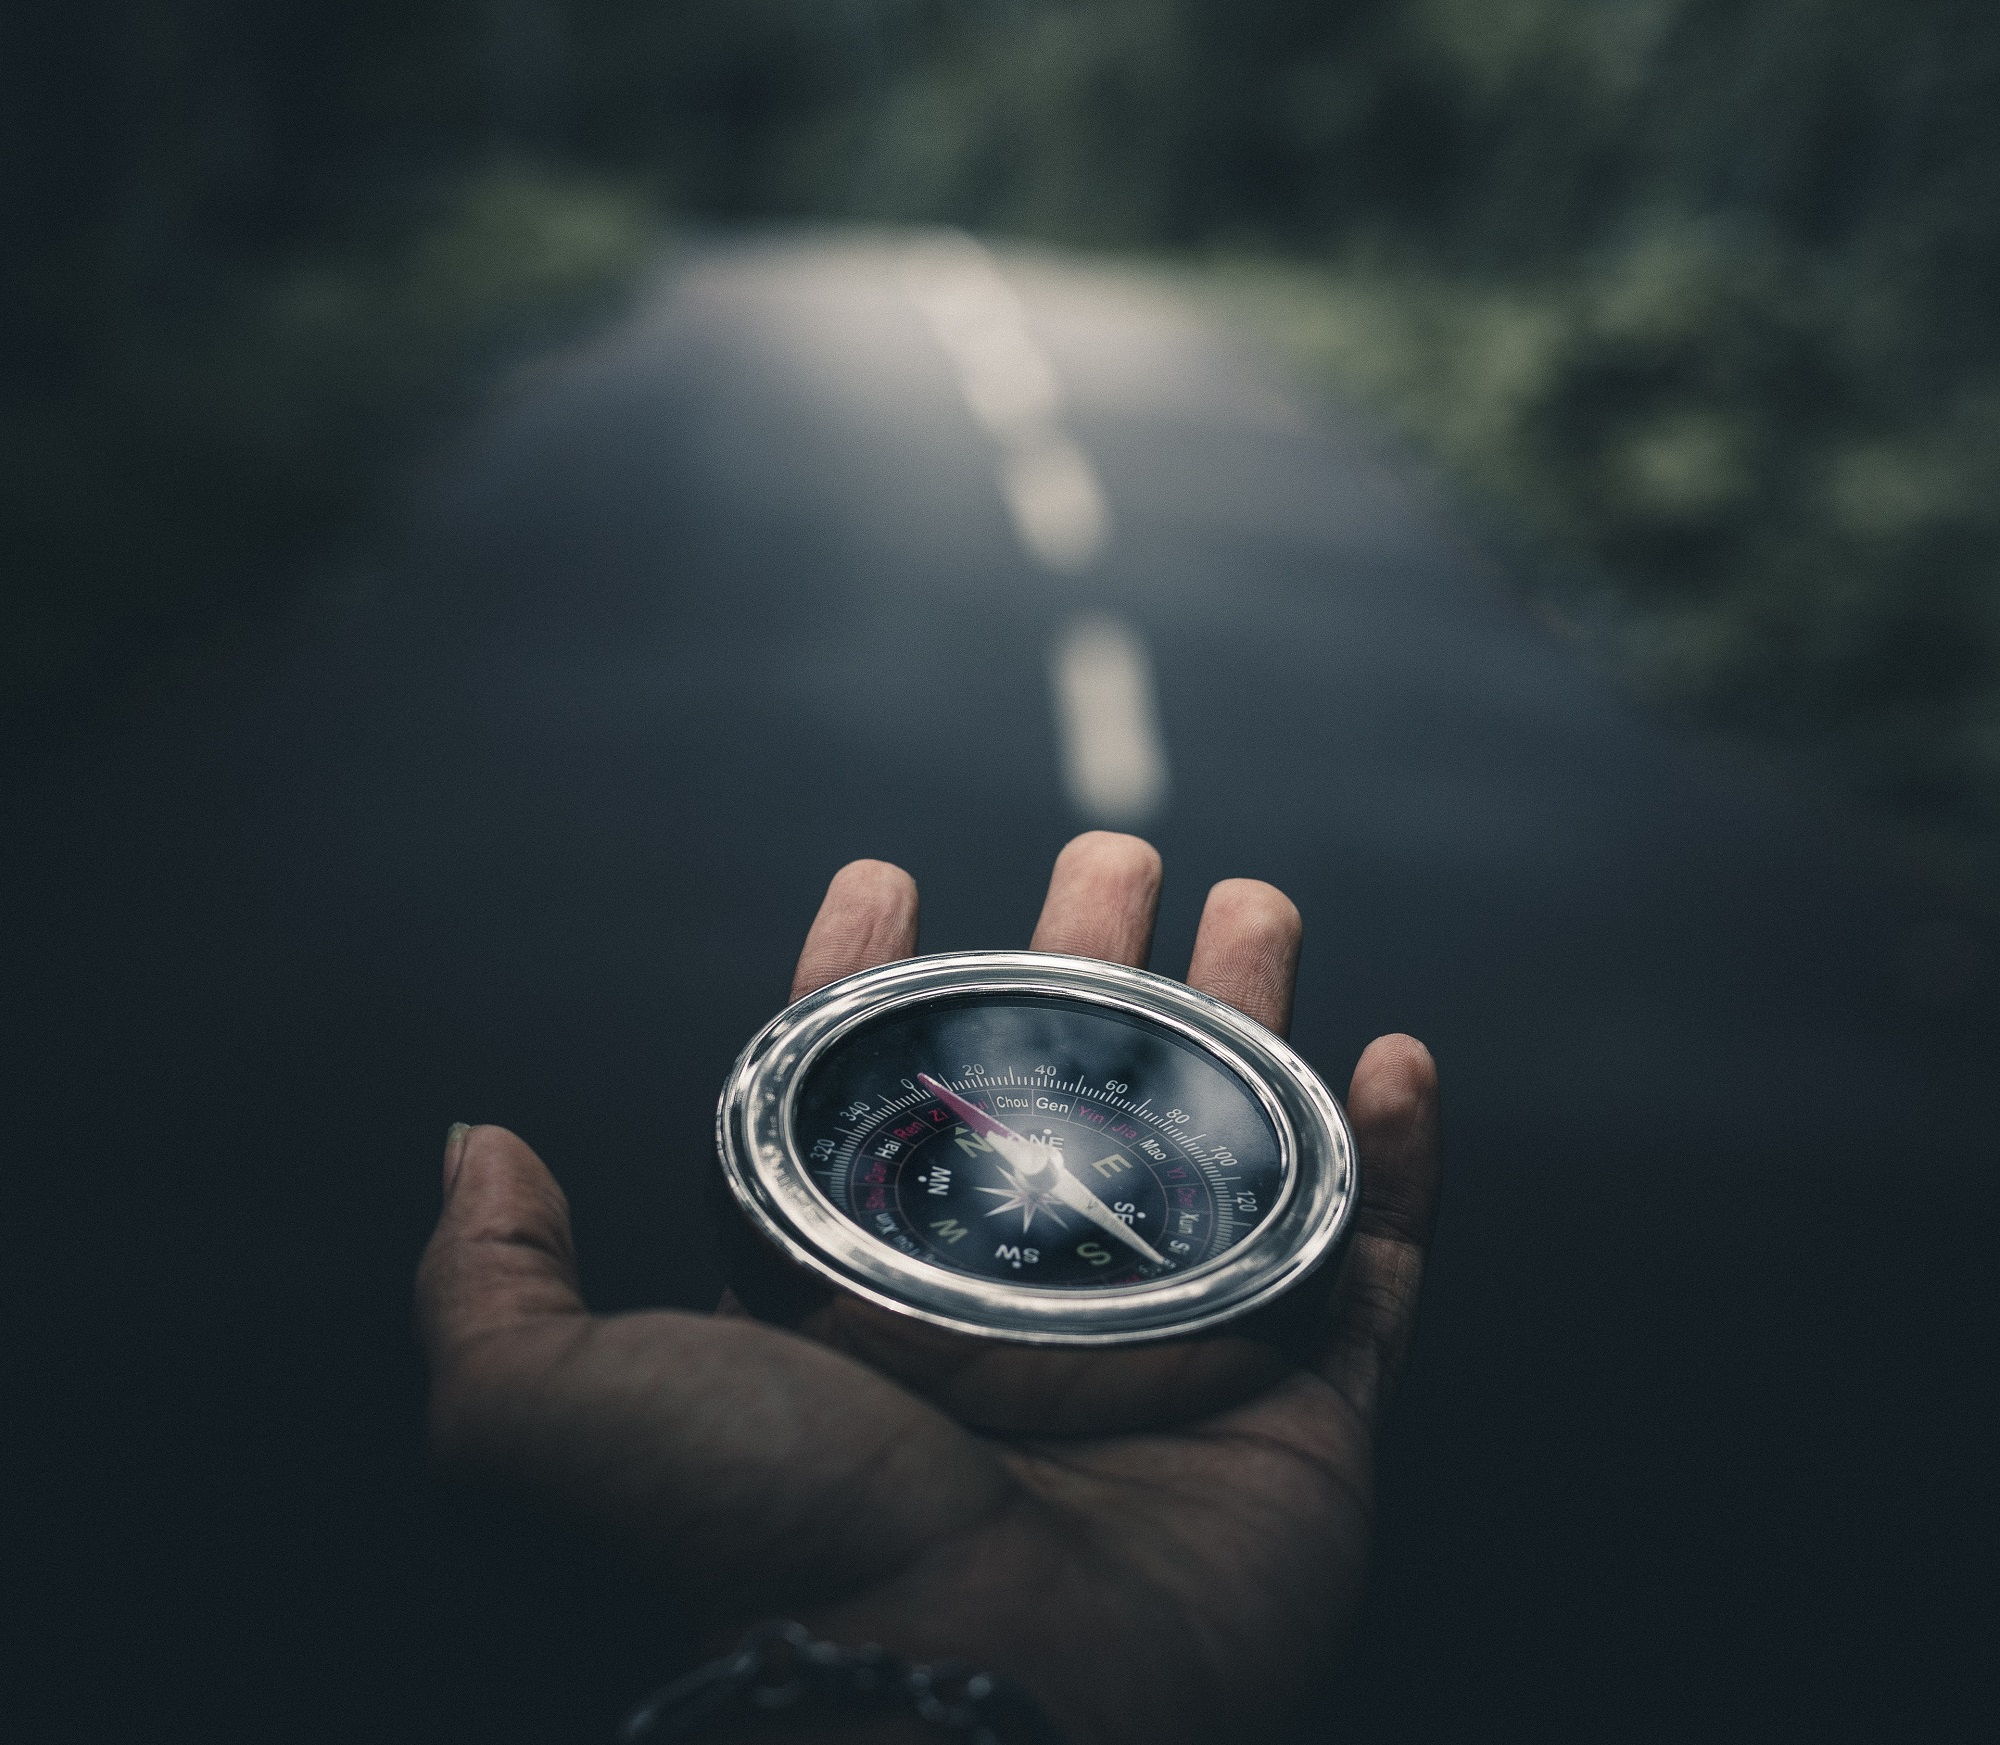 provide navigation